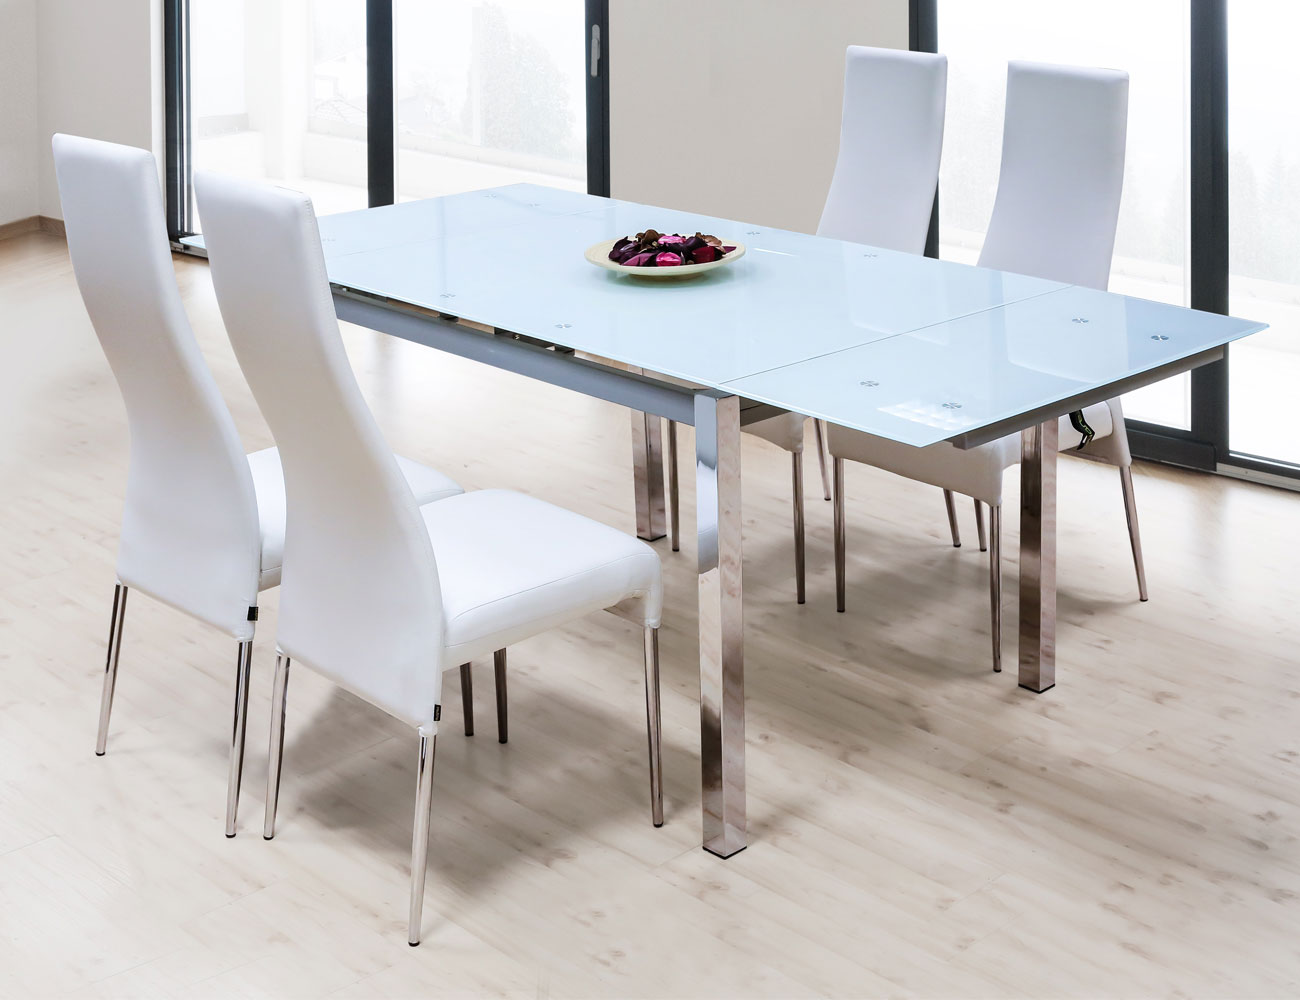 Mesa de comedor de cristal templado extensible con alas - Mesas comedor cristal ...